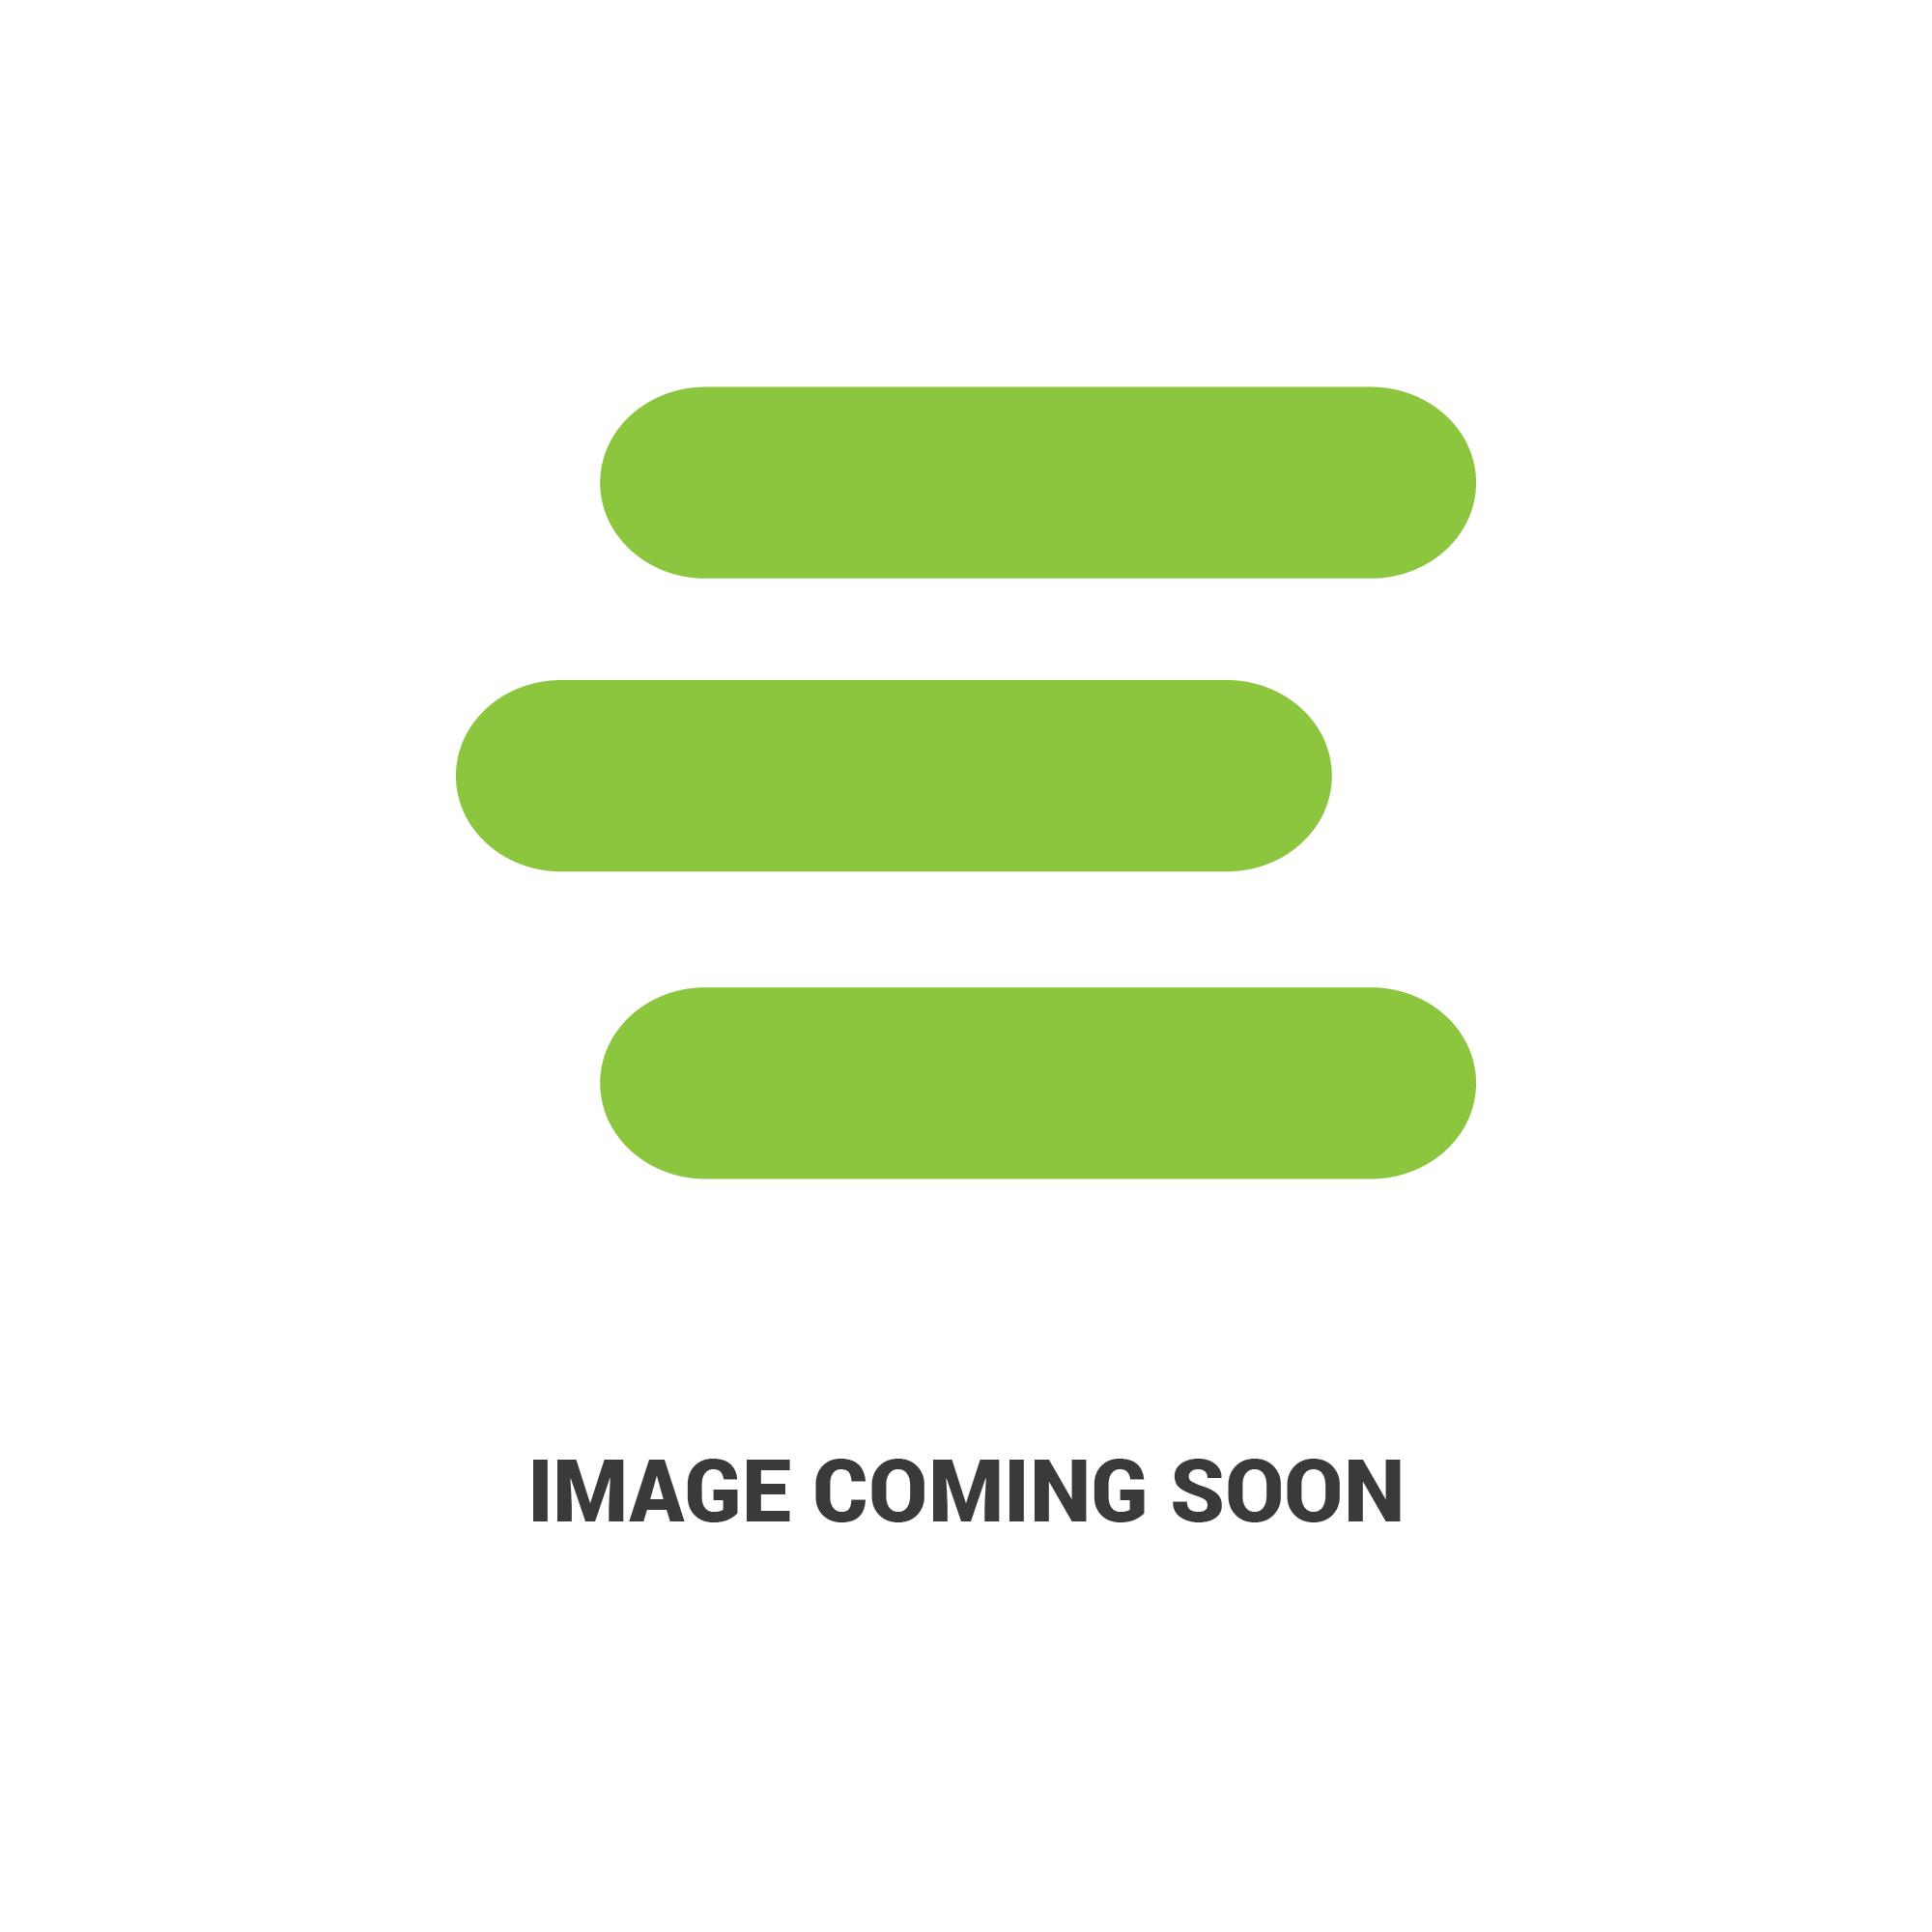 E-16030-51050edit 3.jpg